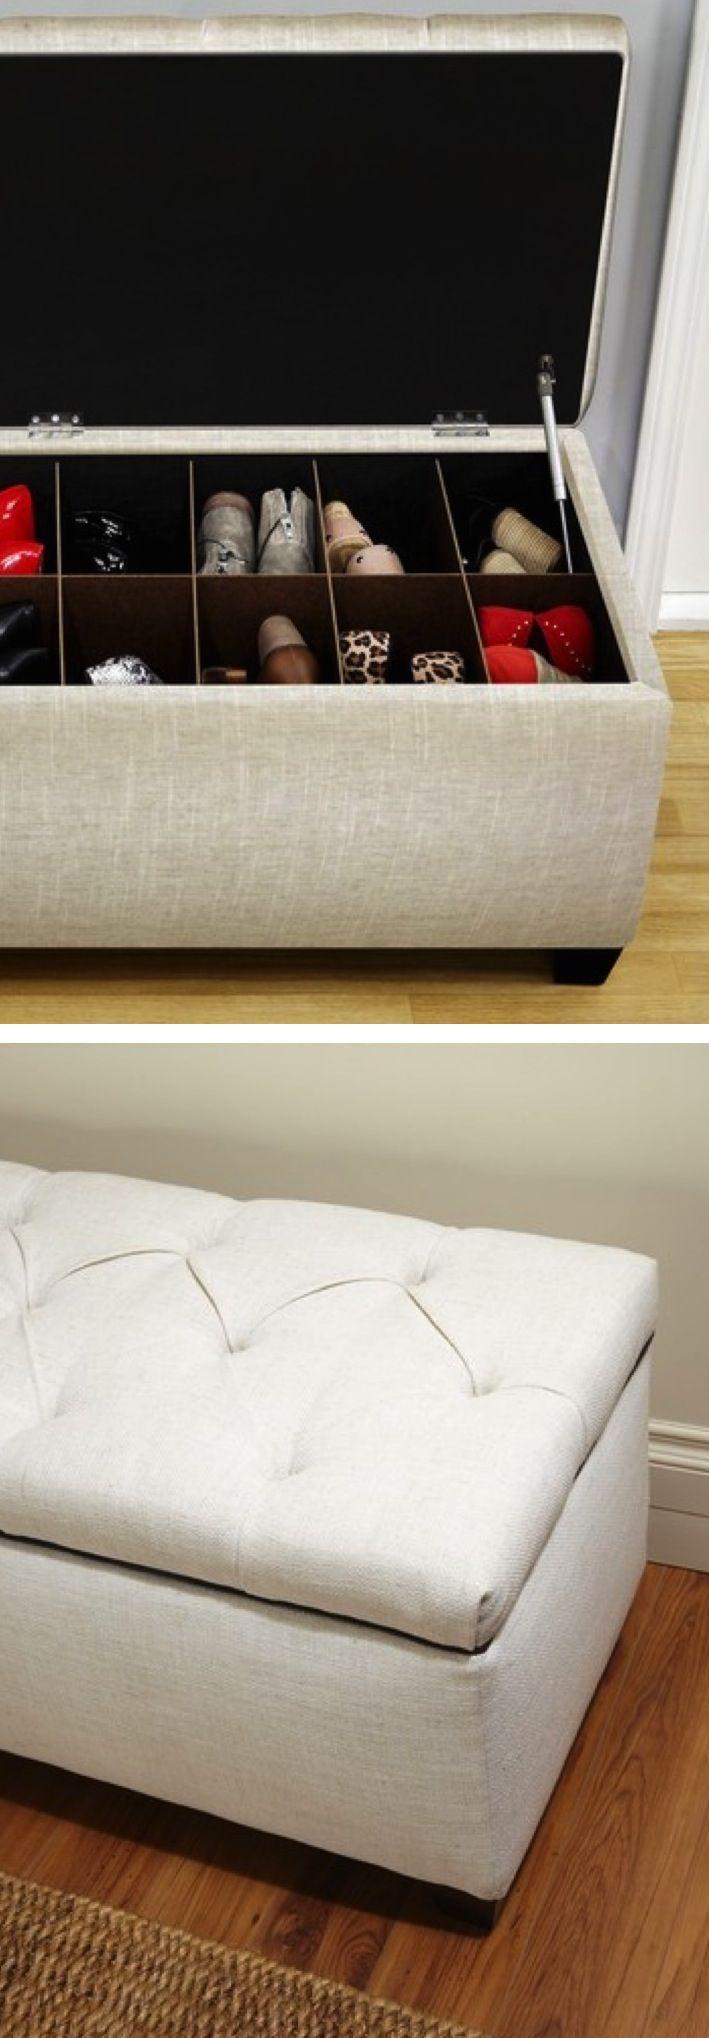 Upholstered Shoe Storage Bench - 25+ Best Ideas About Shoe Storage Benches On Pinterest Entryway